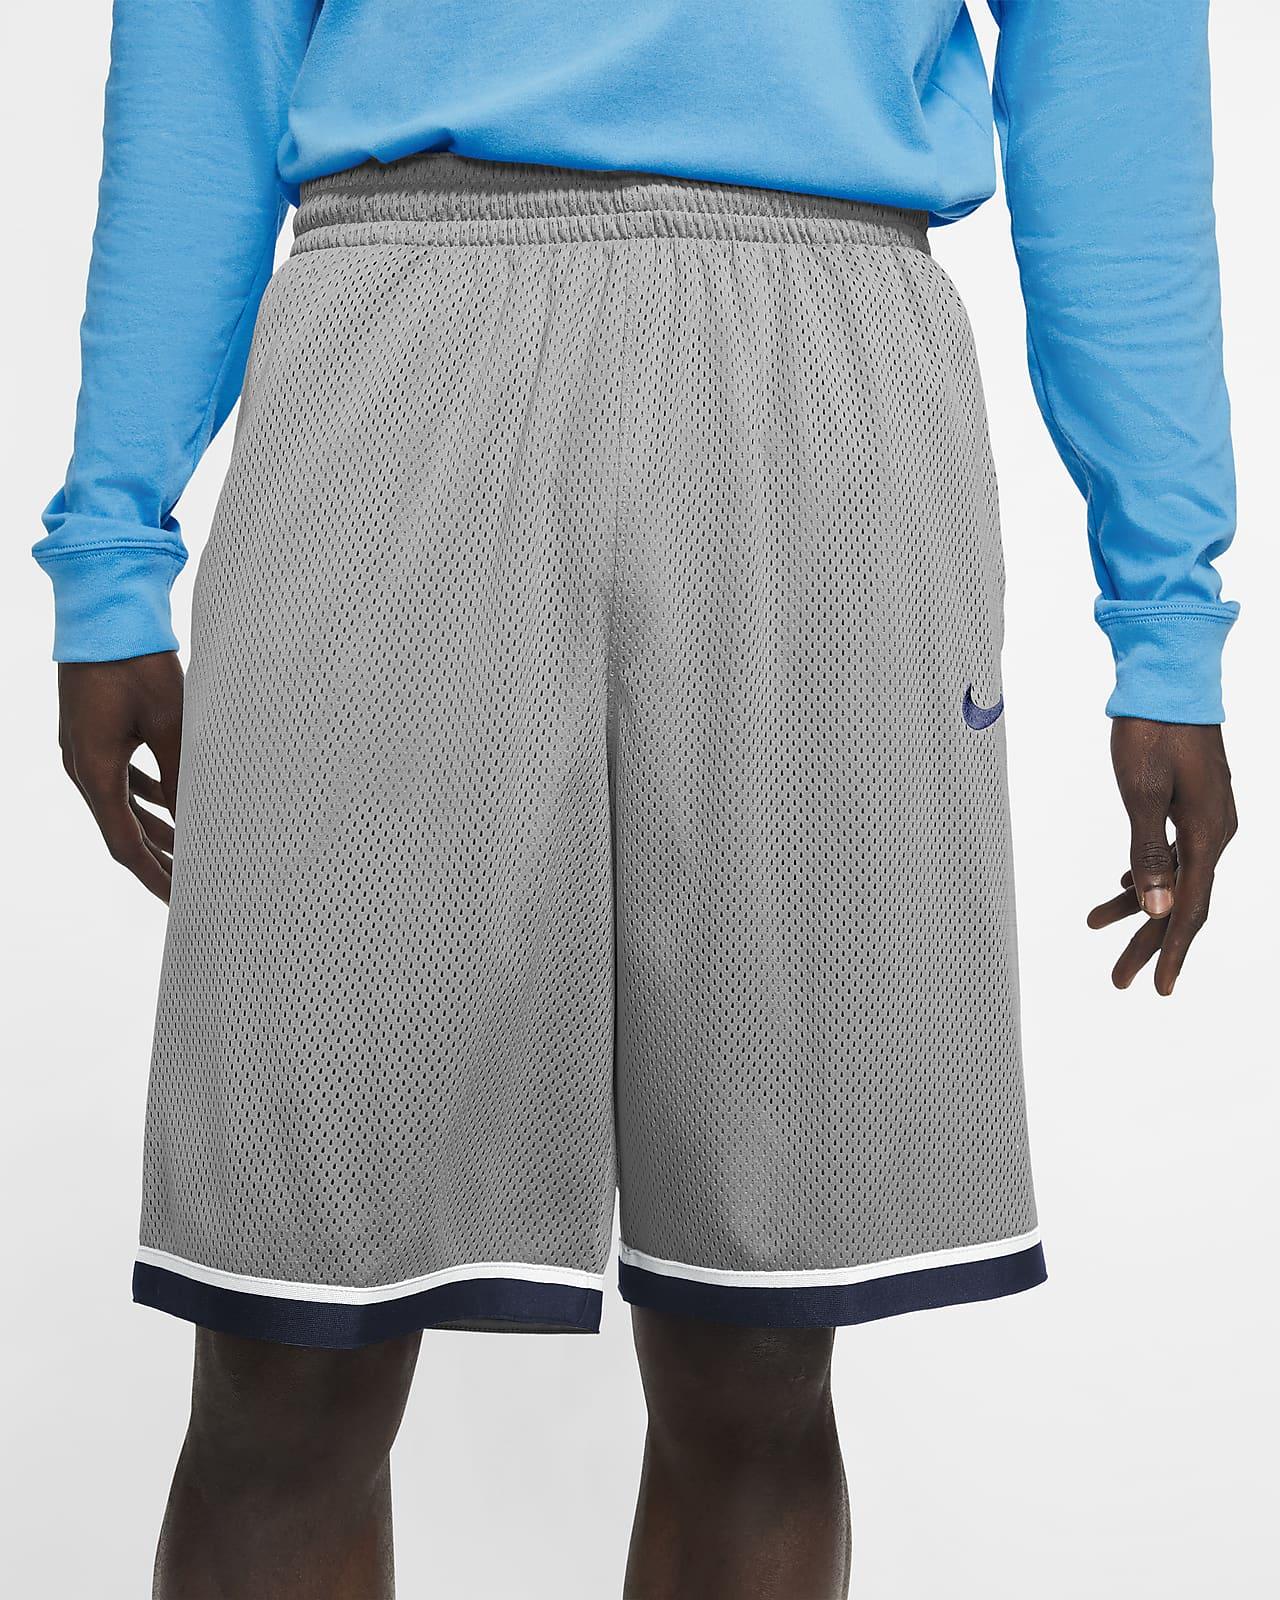 Nike Dri-FIT Classic Men's Basketball Shorts